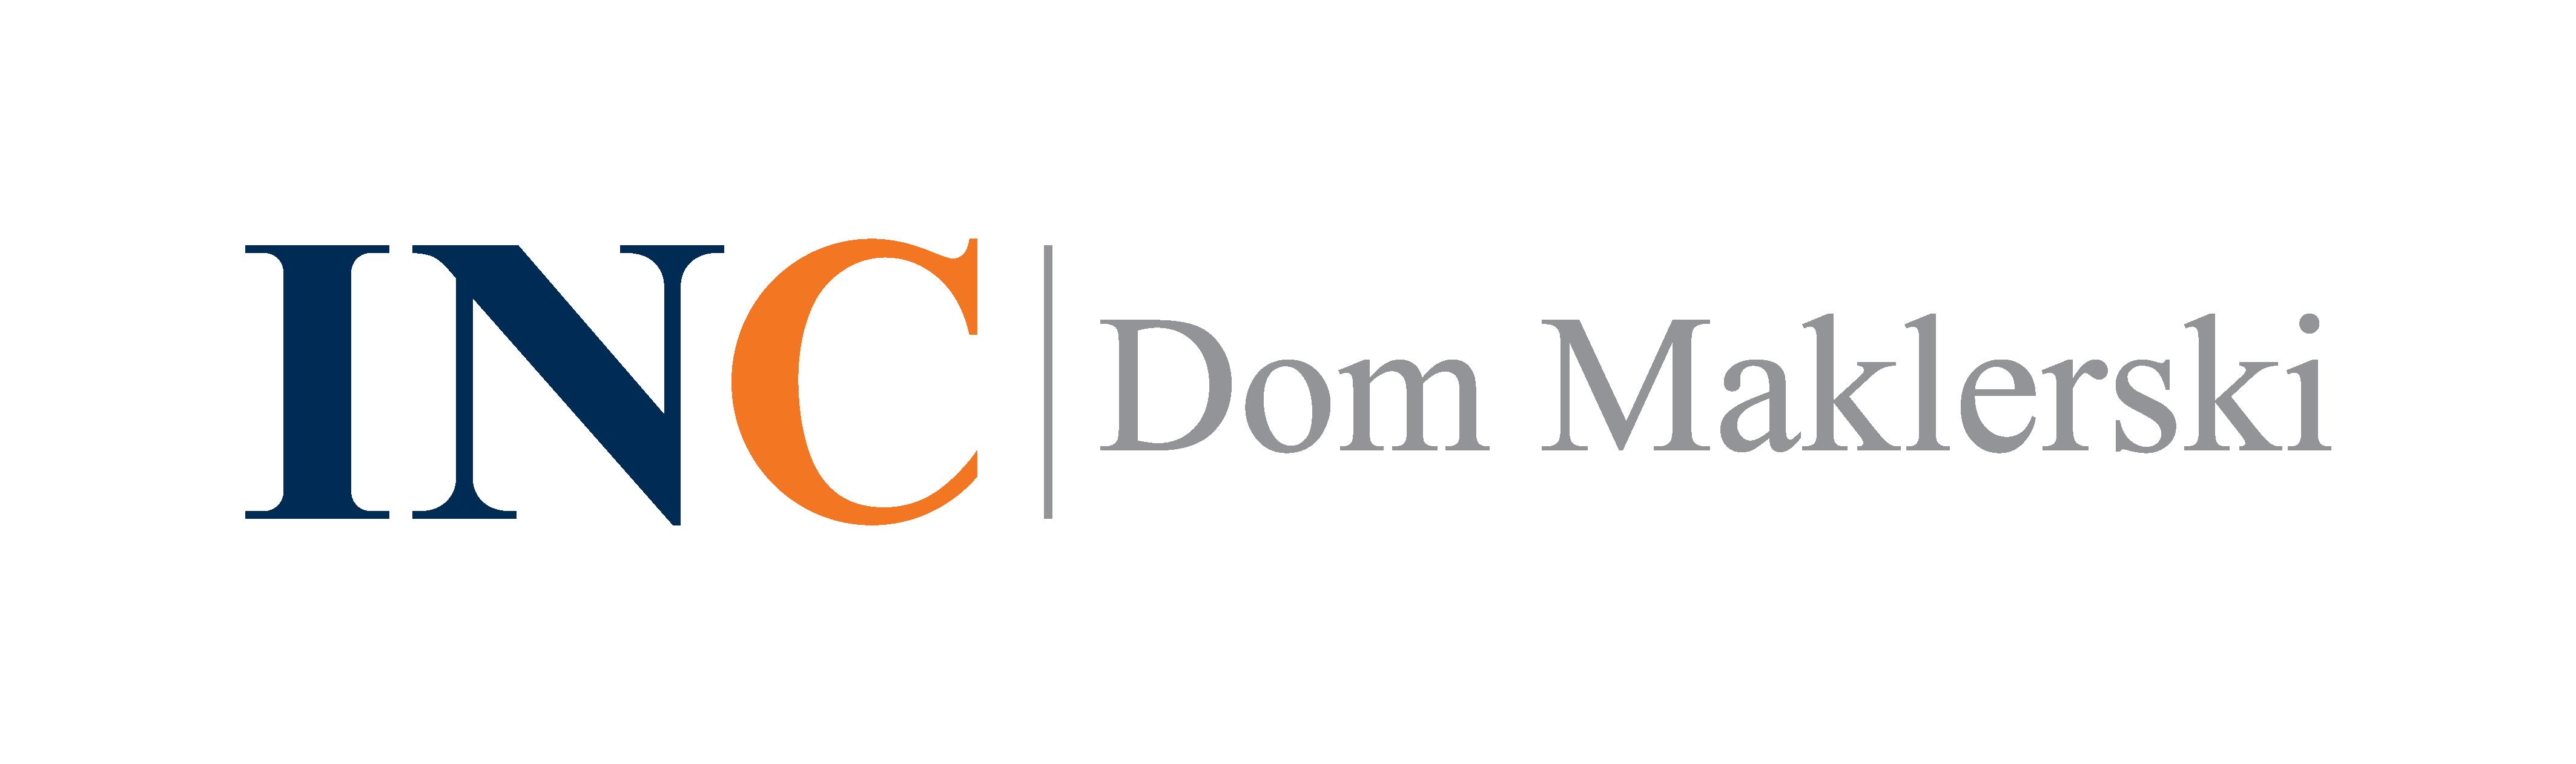 INC Dom Maklerski